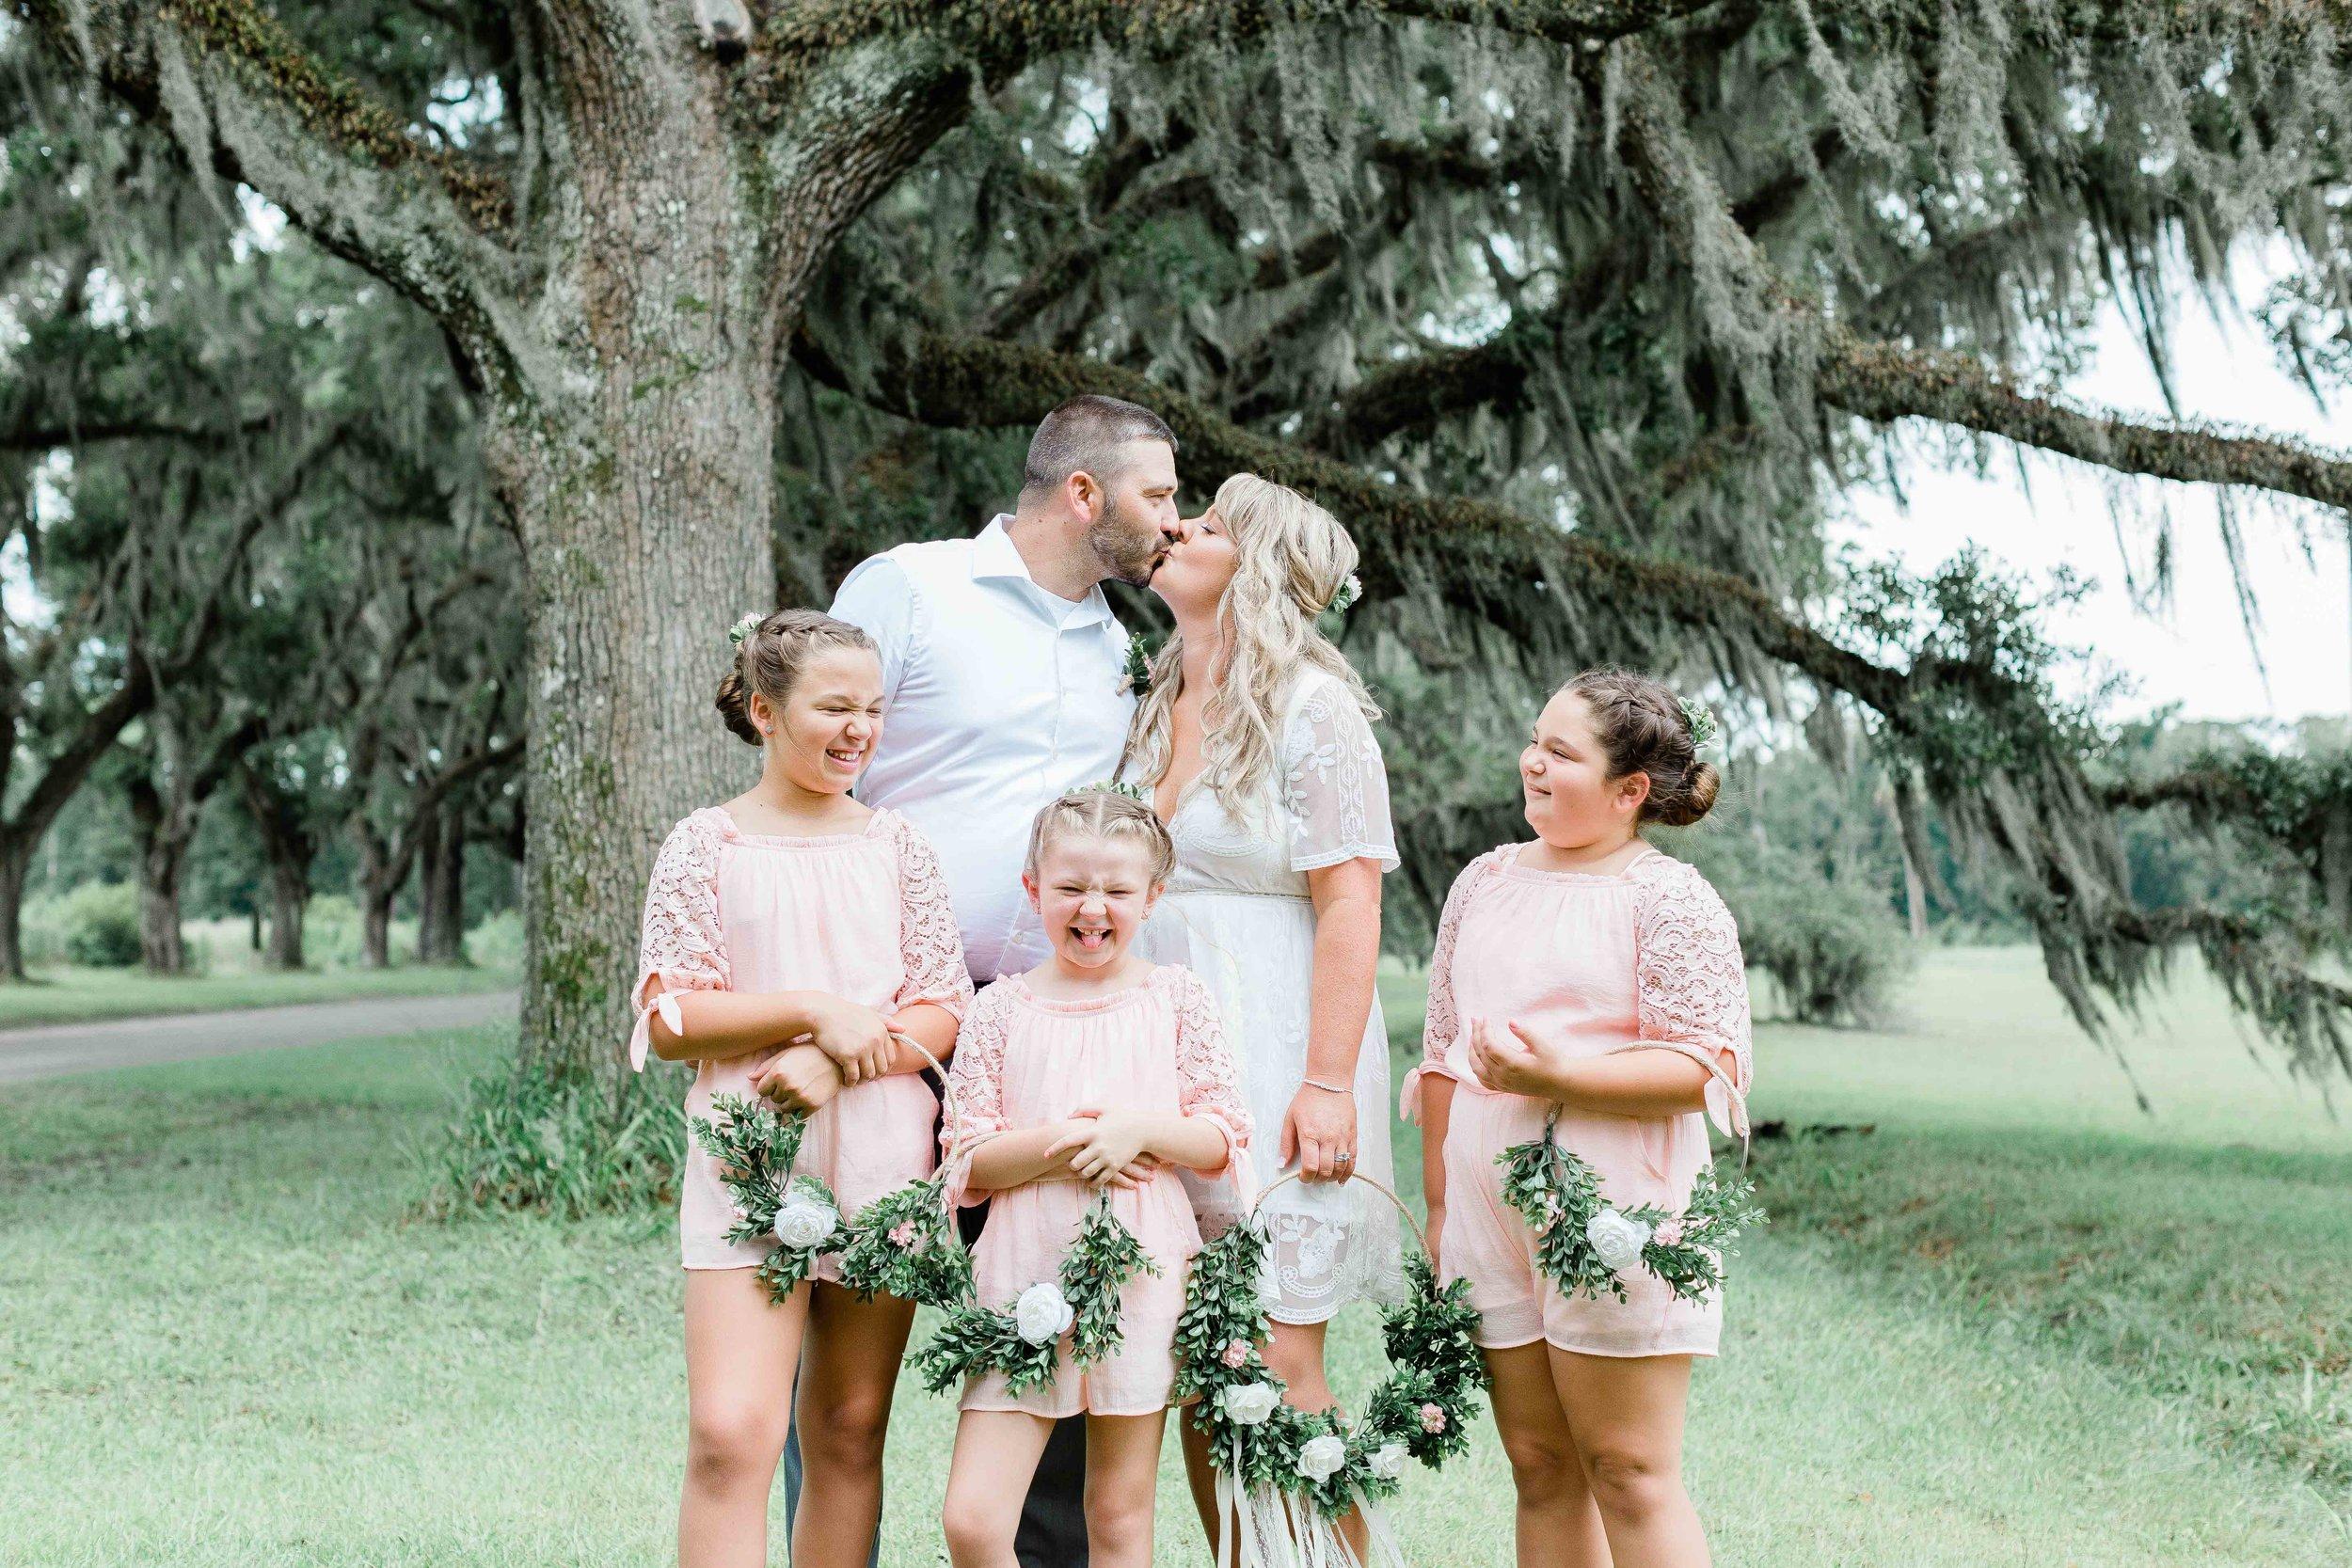 20190727Georgia-Wormlsoe Plantation-Simply Eloped-Savannah Wedding Photographer- Southern Lens Photography16.jpg